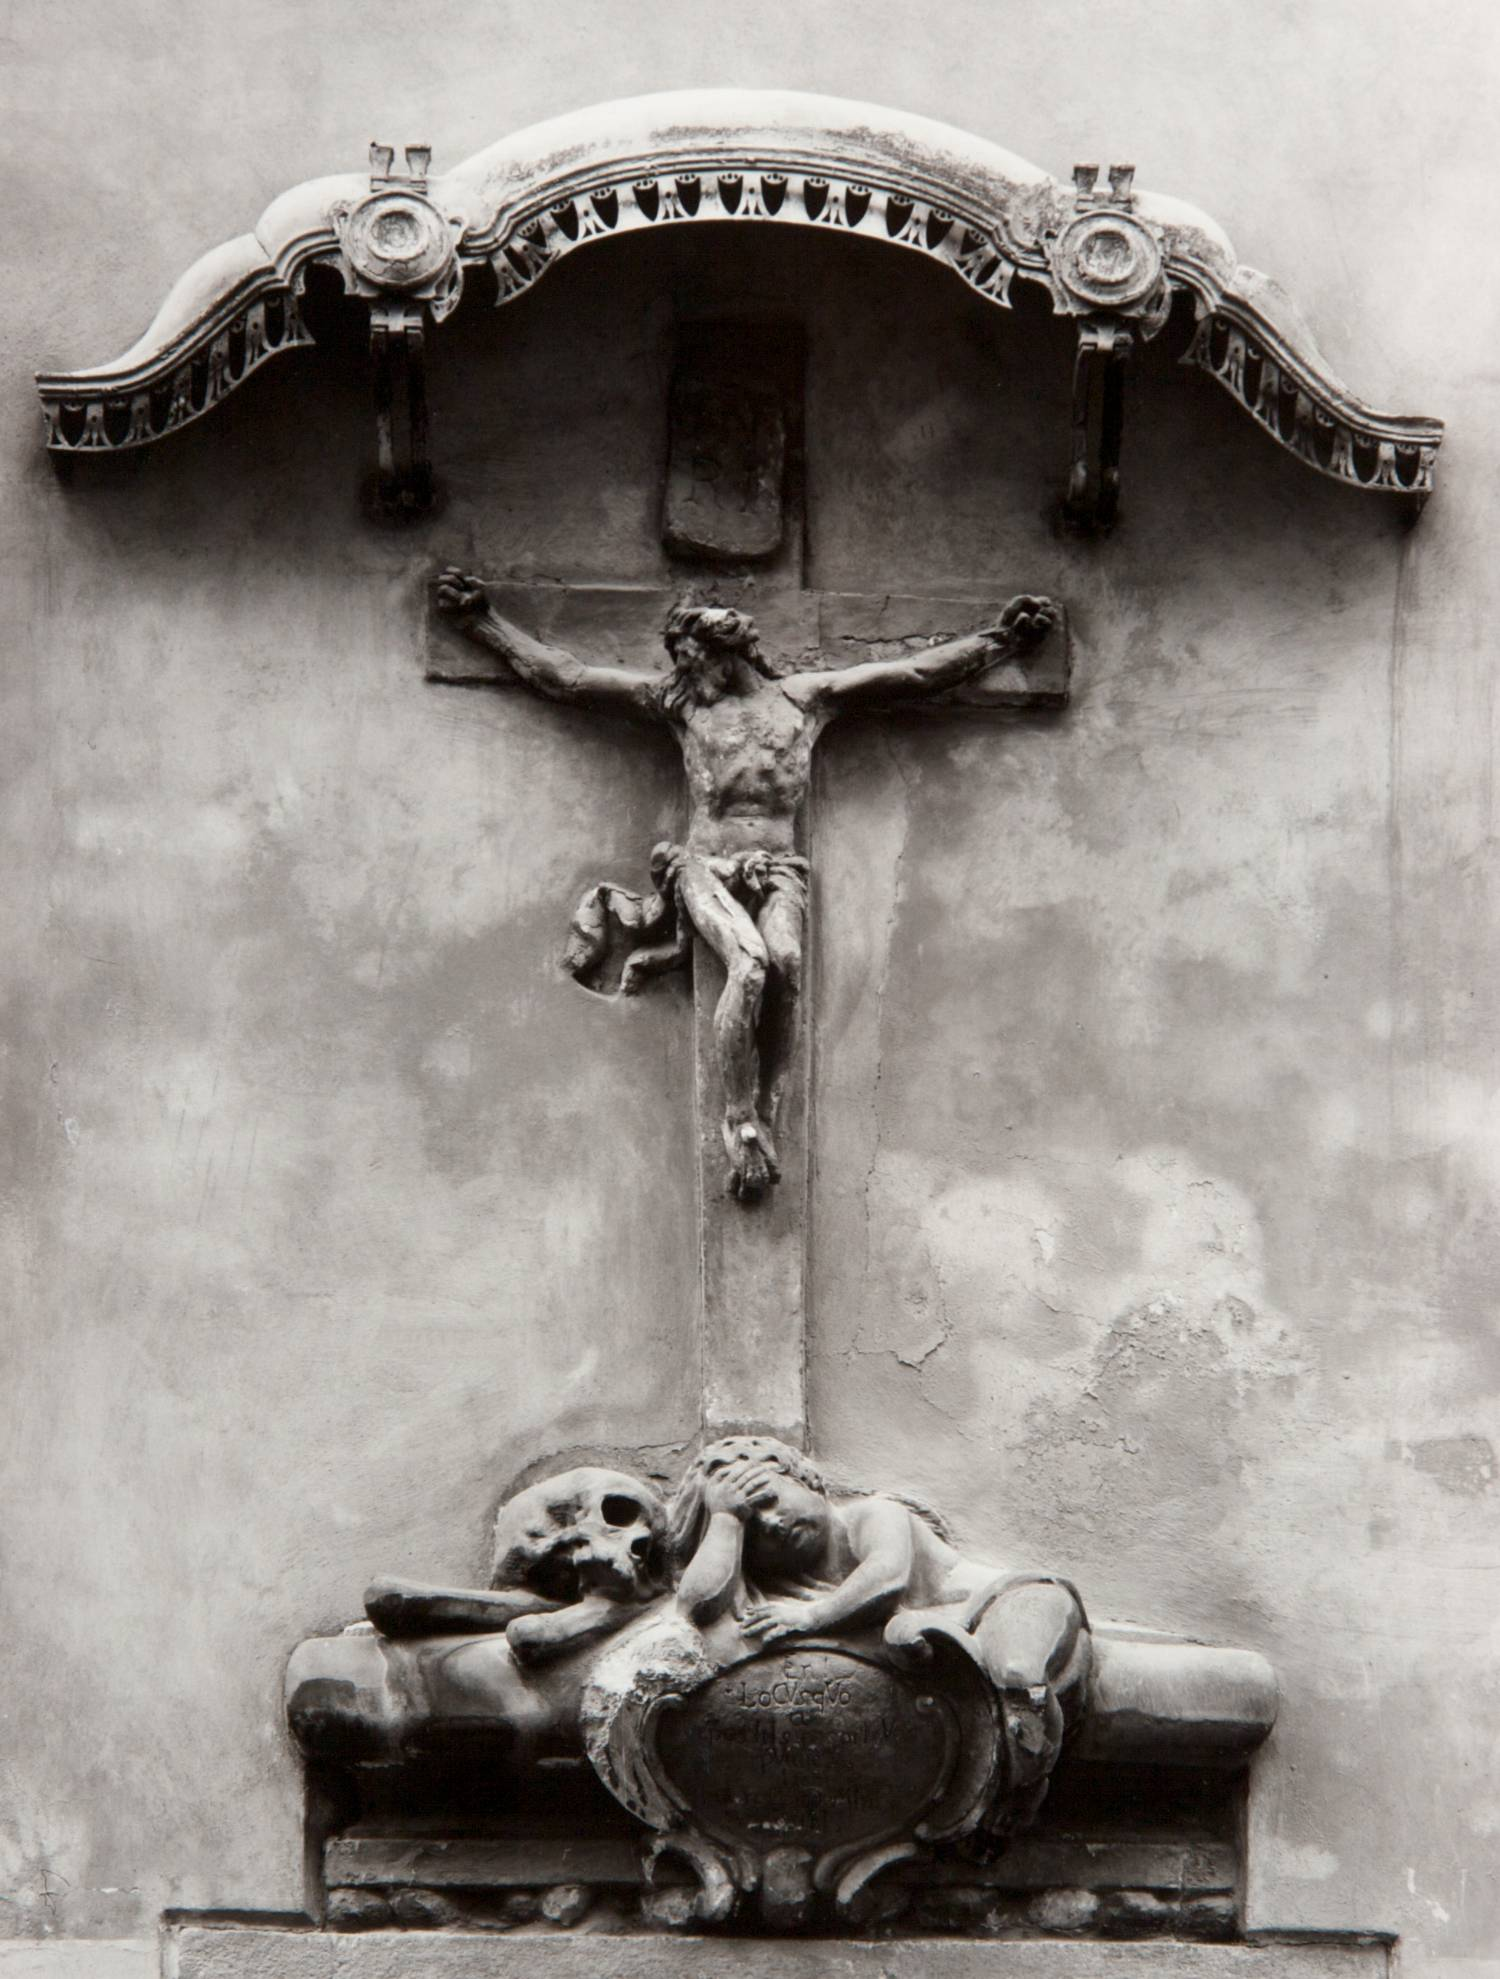 Crucifix at St. James (Prague, Czech Republic)